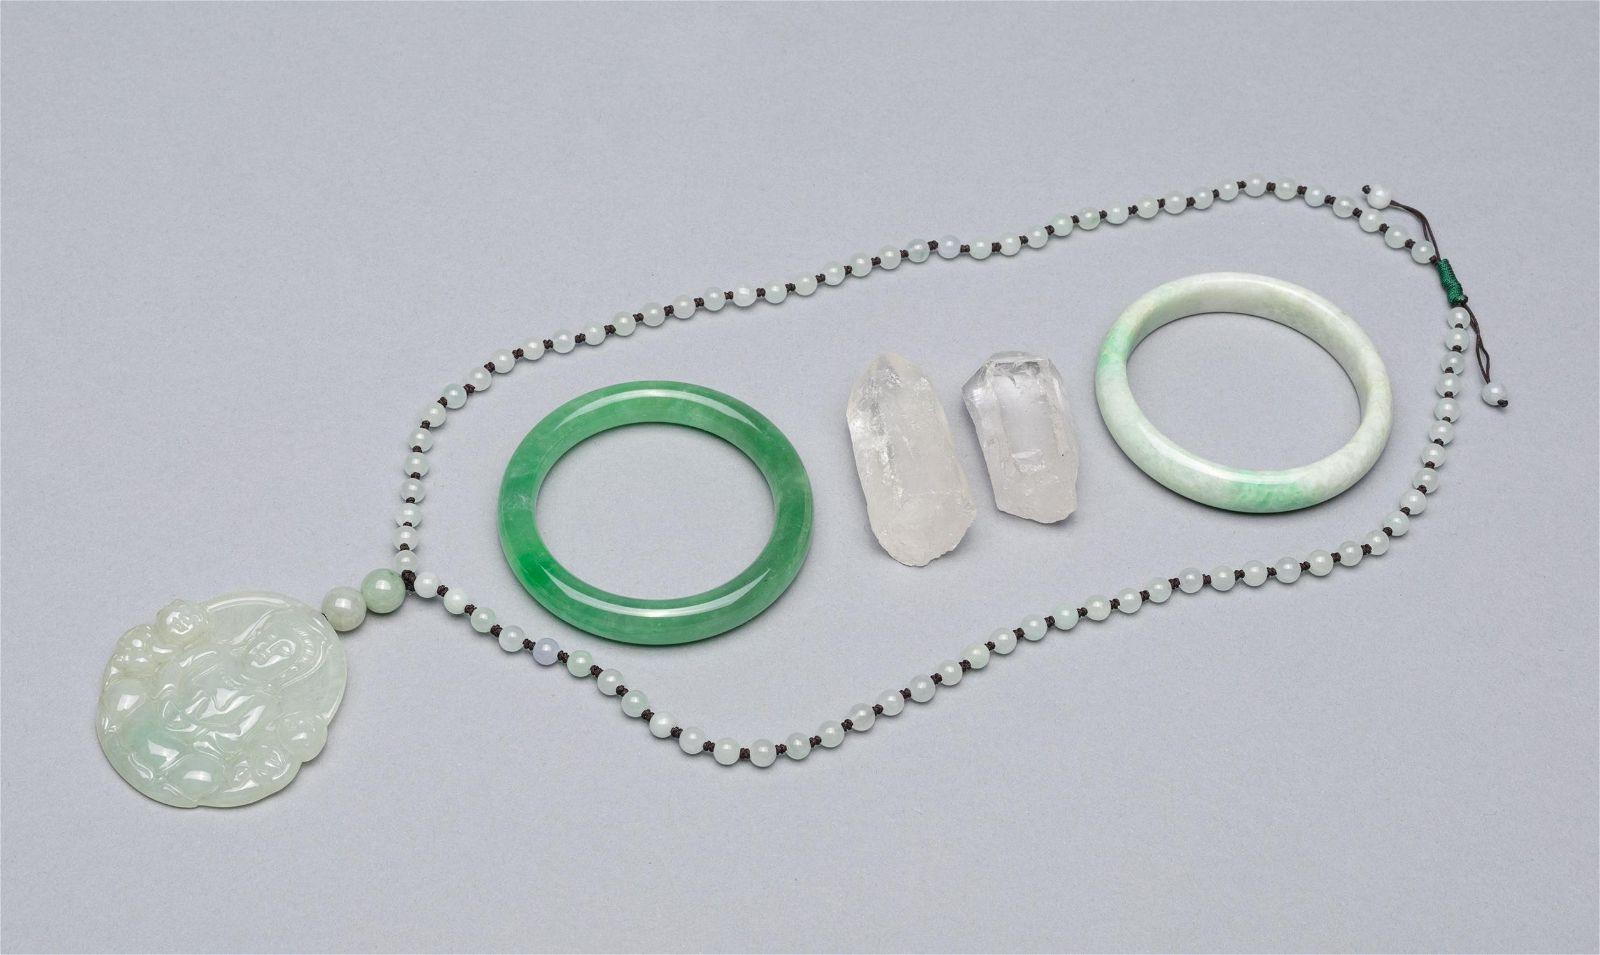 Group Chinese Jade Jadeite Stone Crystal Carvings